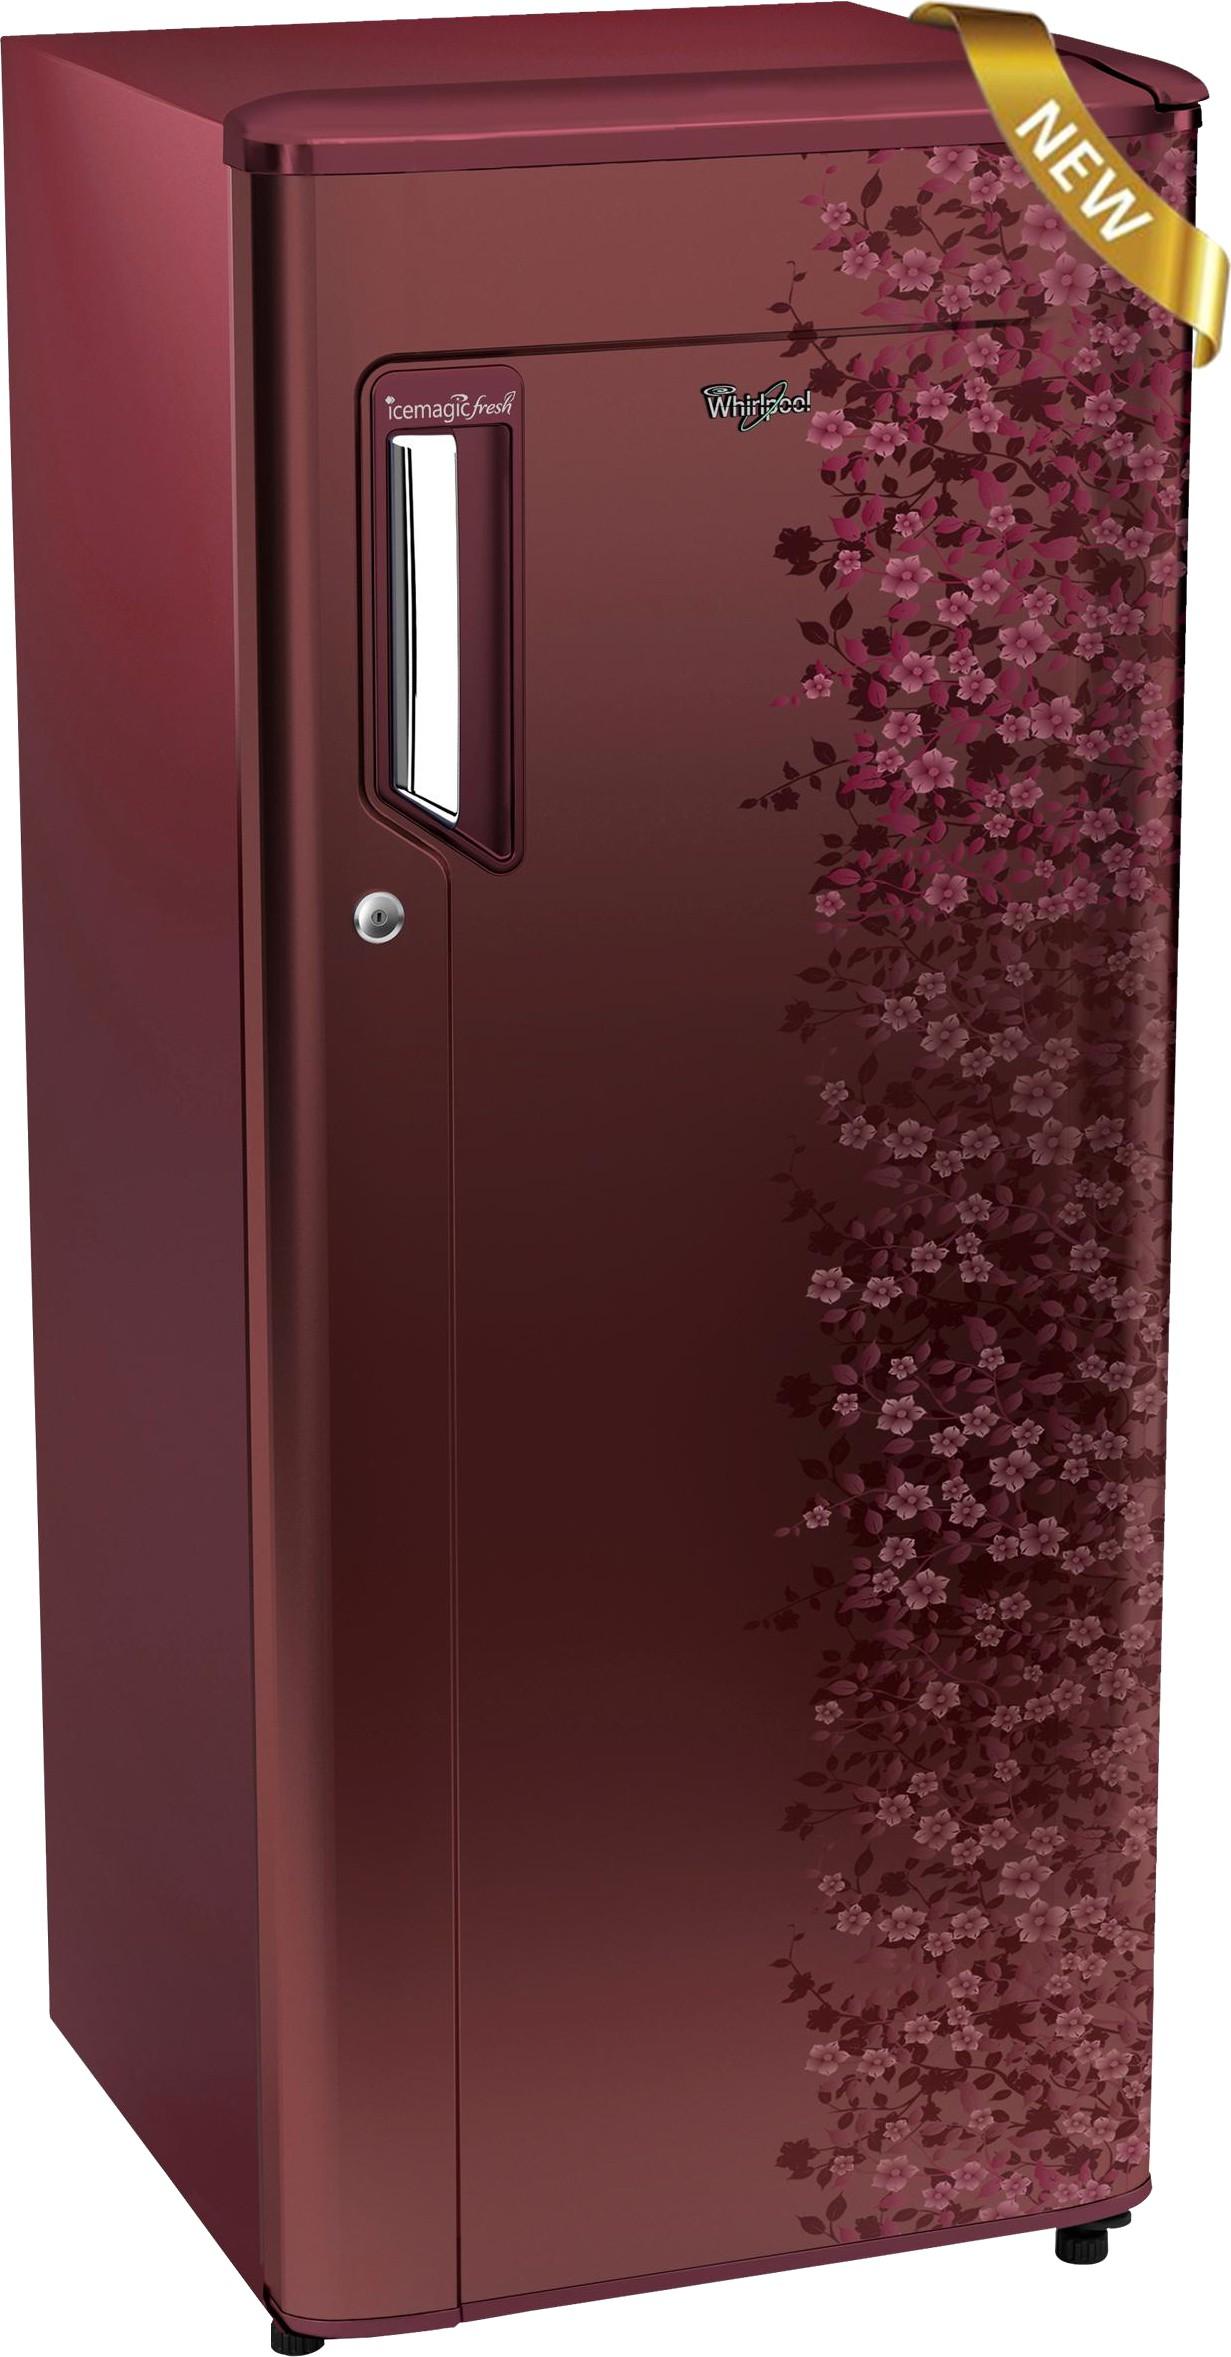 View Whirlpool 260 IMFRESH PRM 4S 245 L Single Door Refrigerator  Price Online